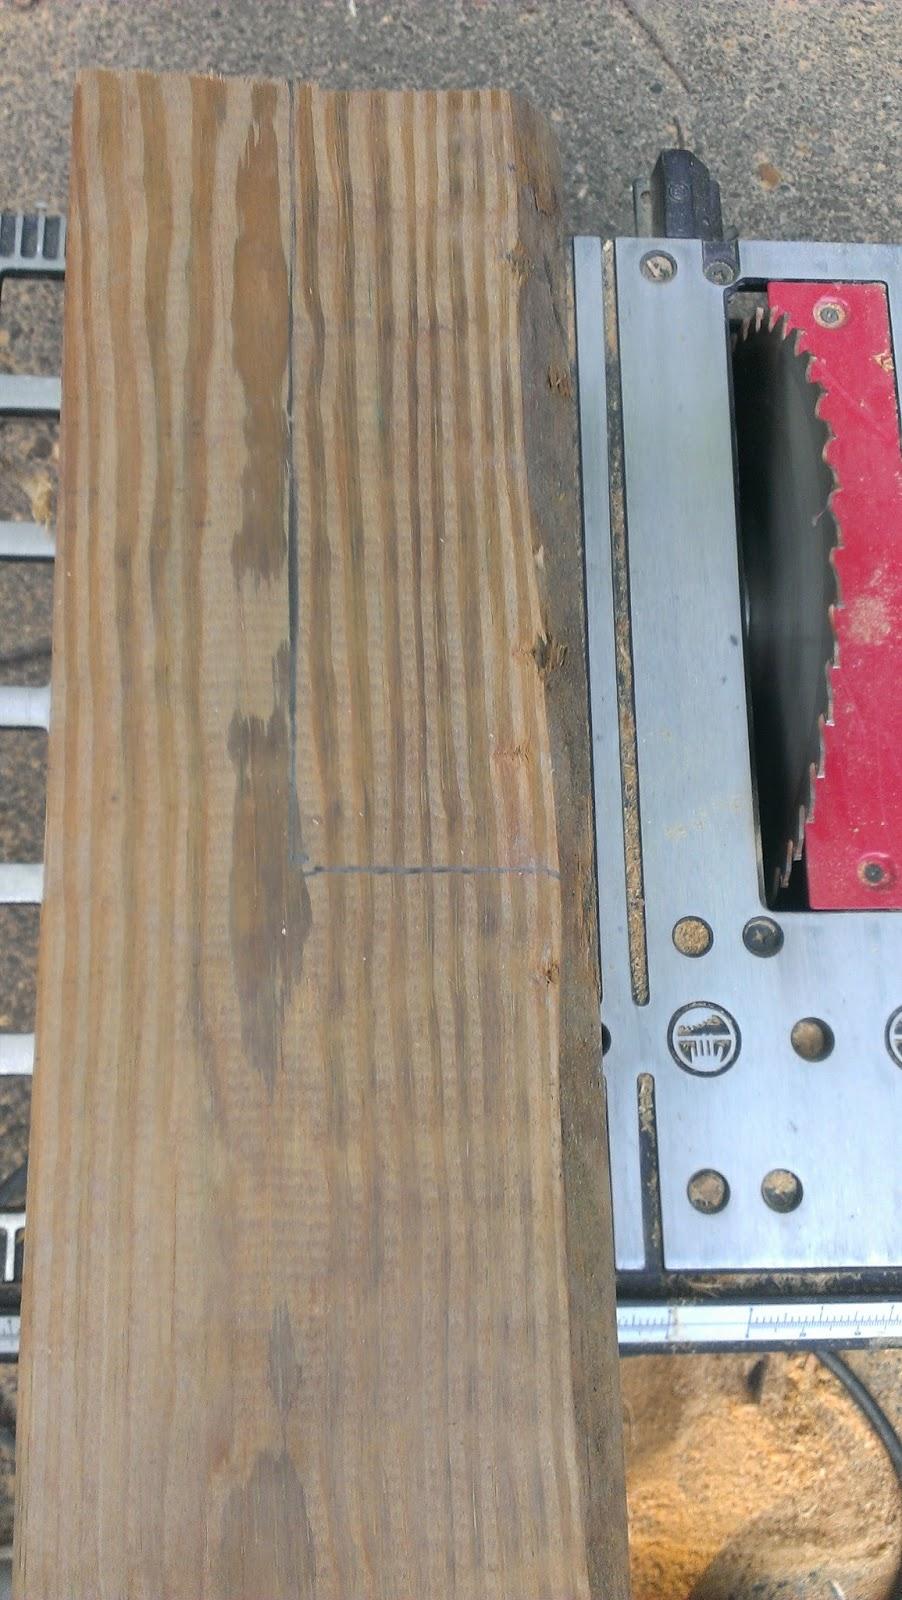 Outdoor Sauna Build How I Built My Wood Fired Sauna Notching 6x6 Foundation Posts